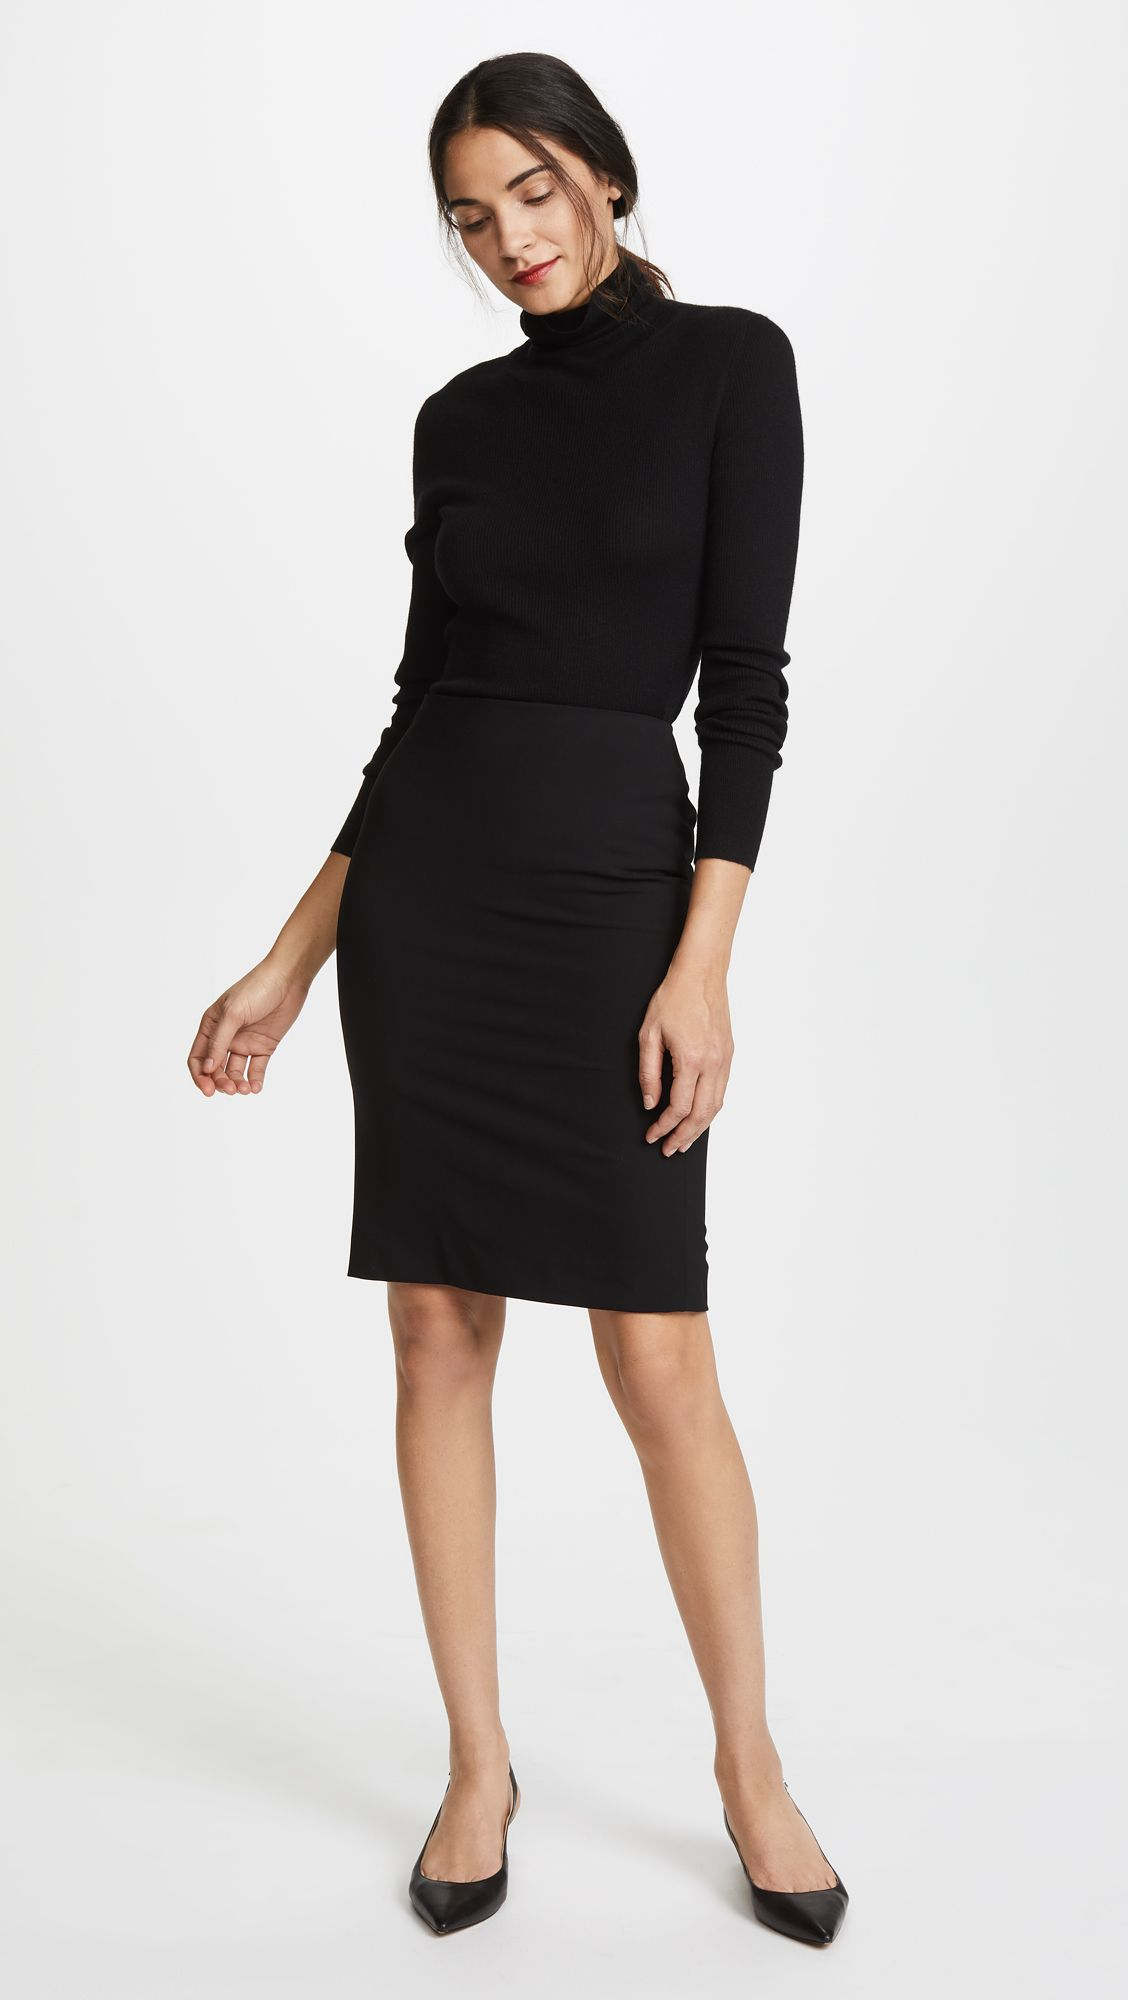 Theory Edition Pencil Skirt Shopbop Black Dress Outfit Casual Simple Black Dress Black Dress Accessories [ 2000 x 1128 Pixel ]